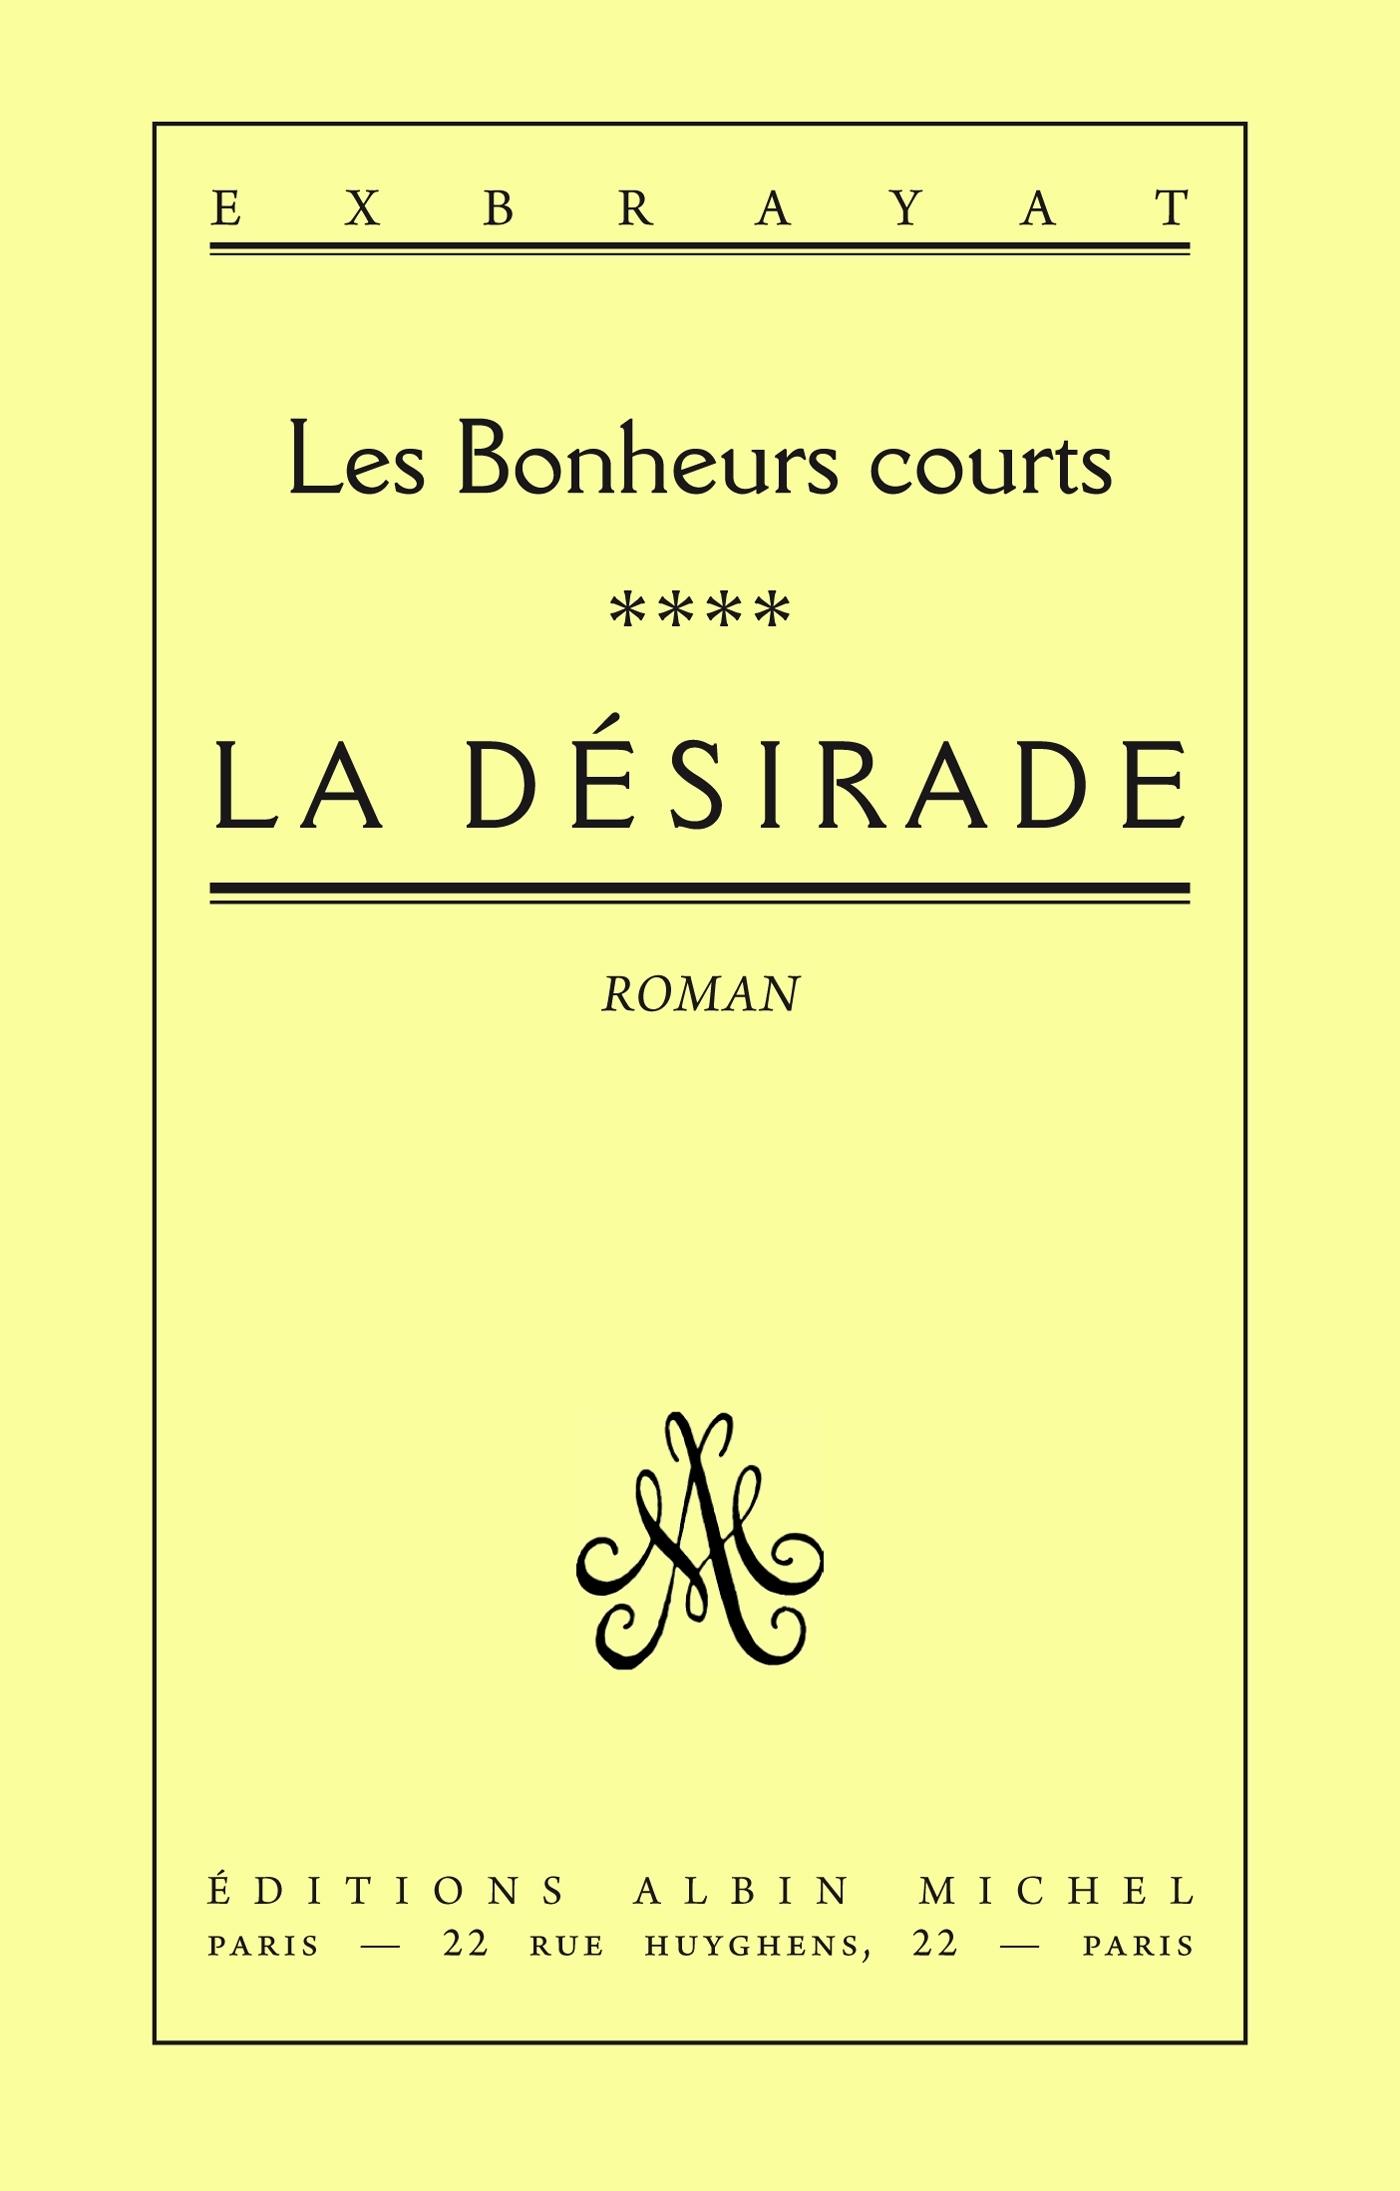 LA DESIRADE - LES BONHEURS COURTS 4